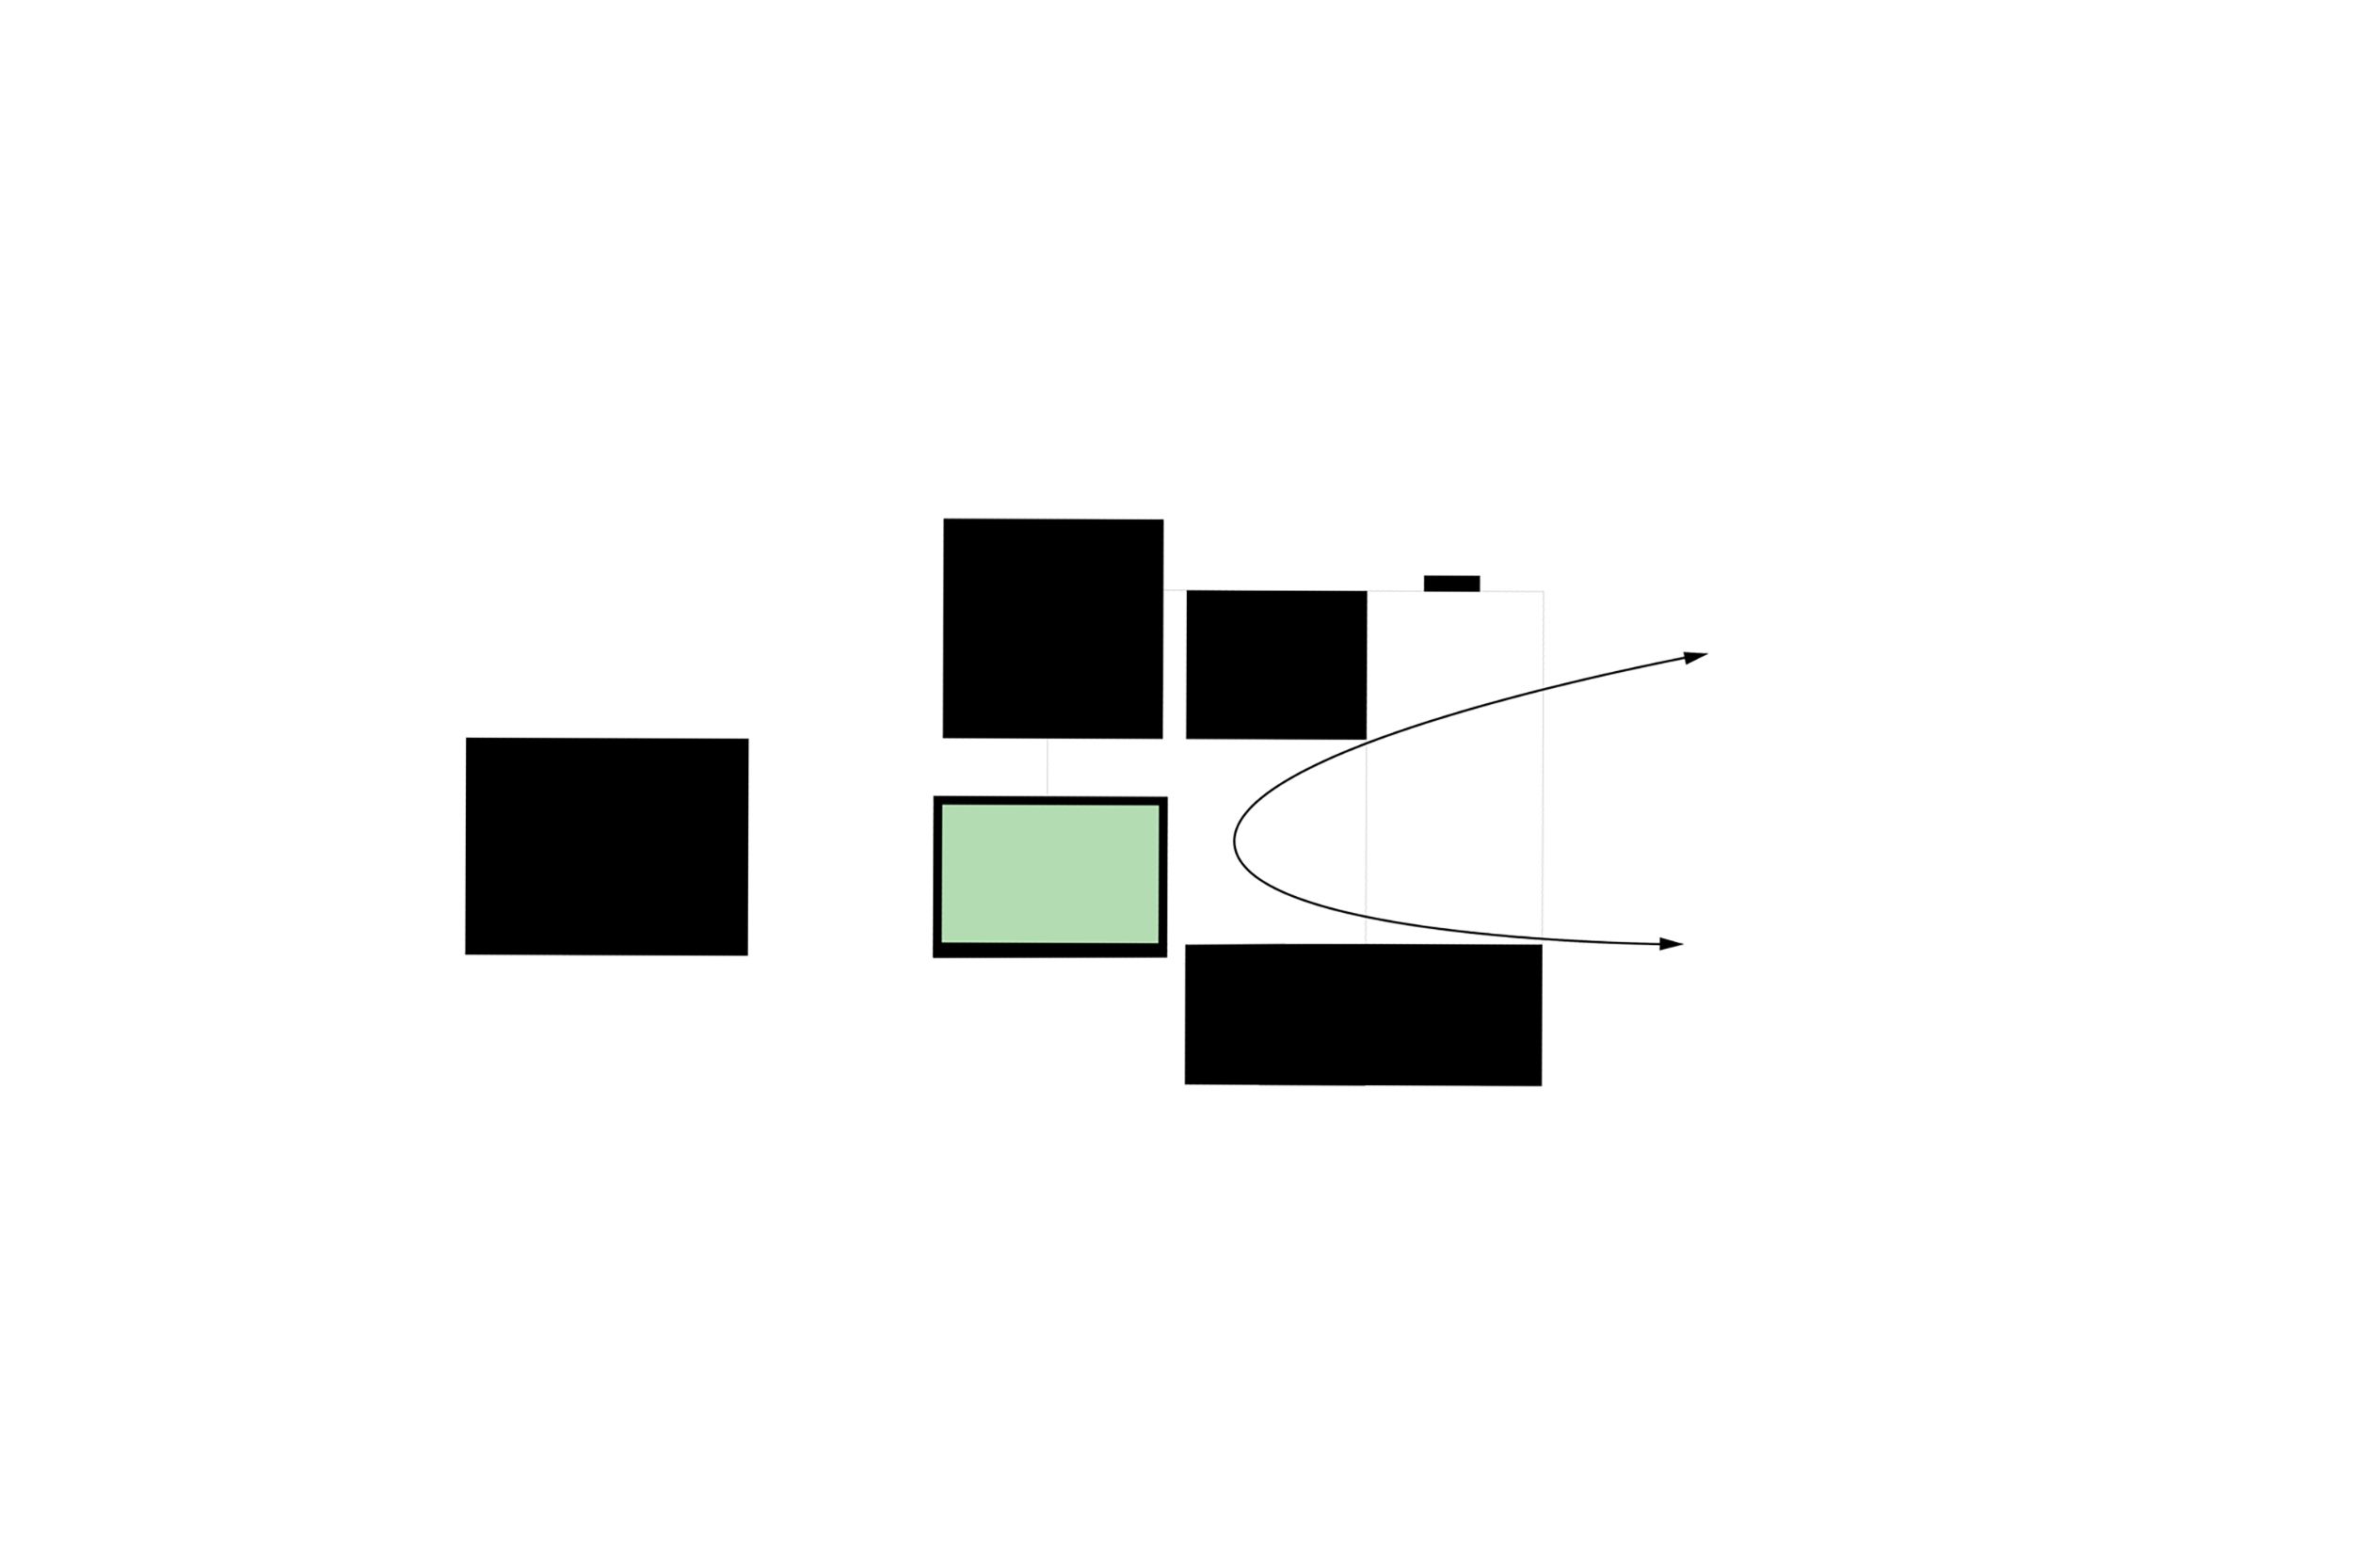 goCstudio_HomeHouse_plan diagram.jpg